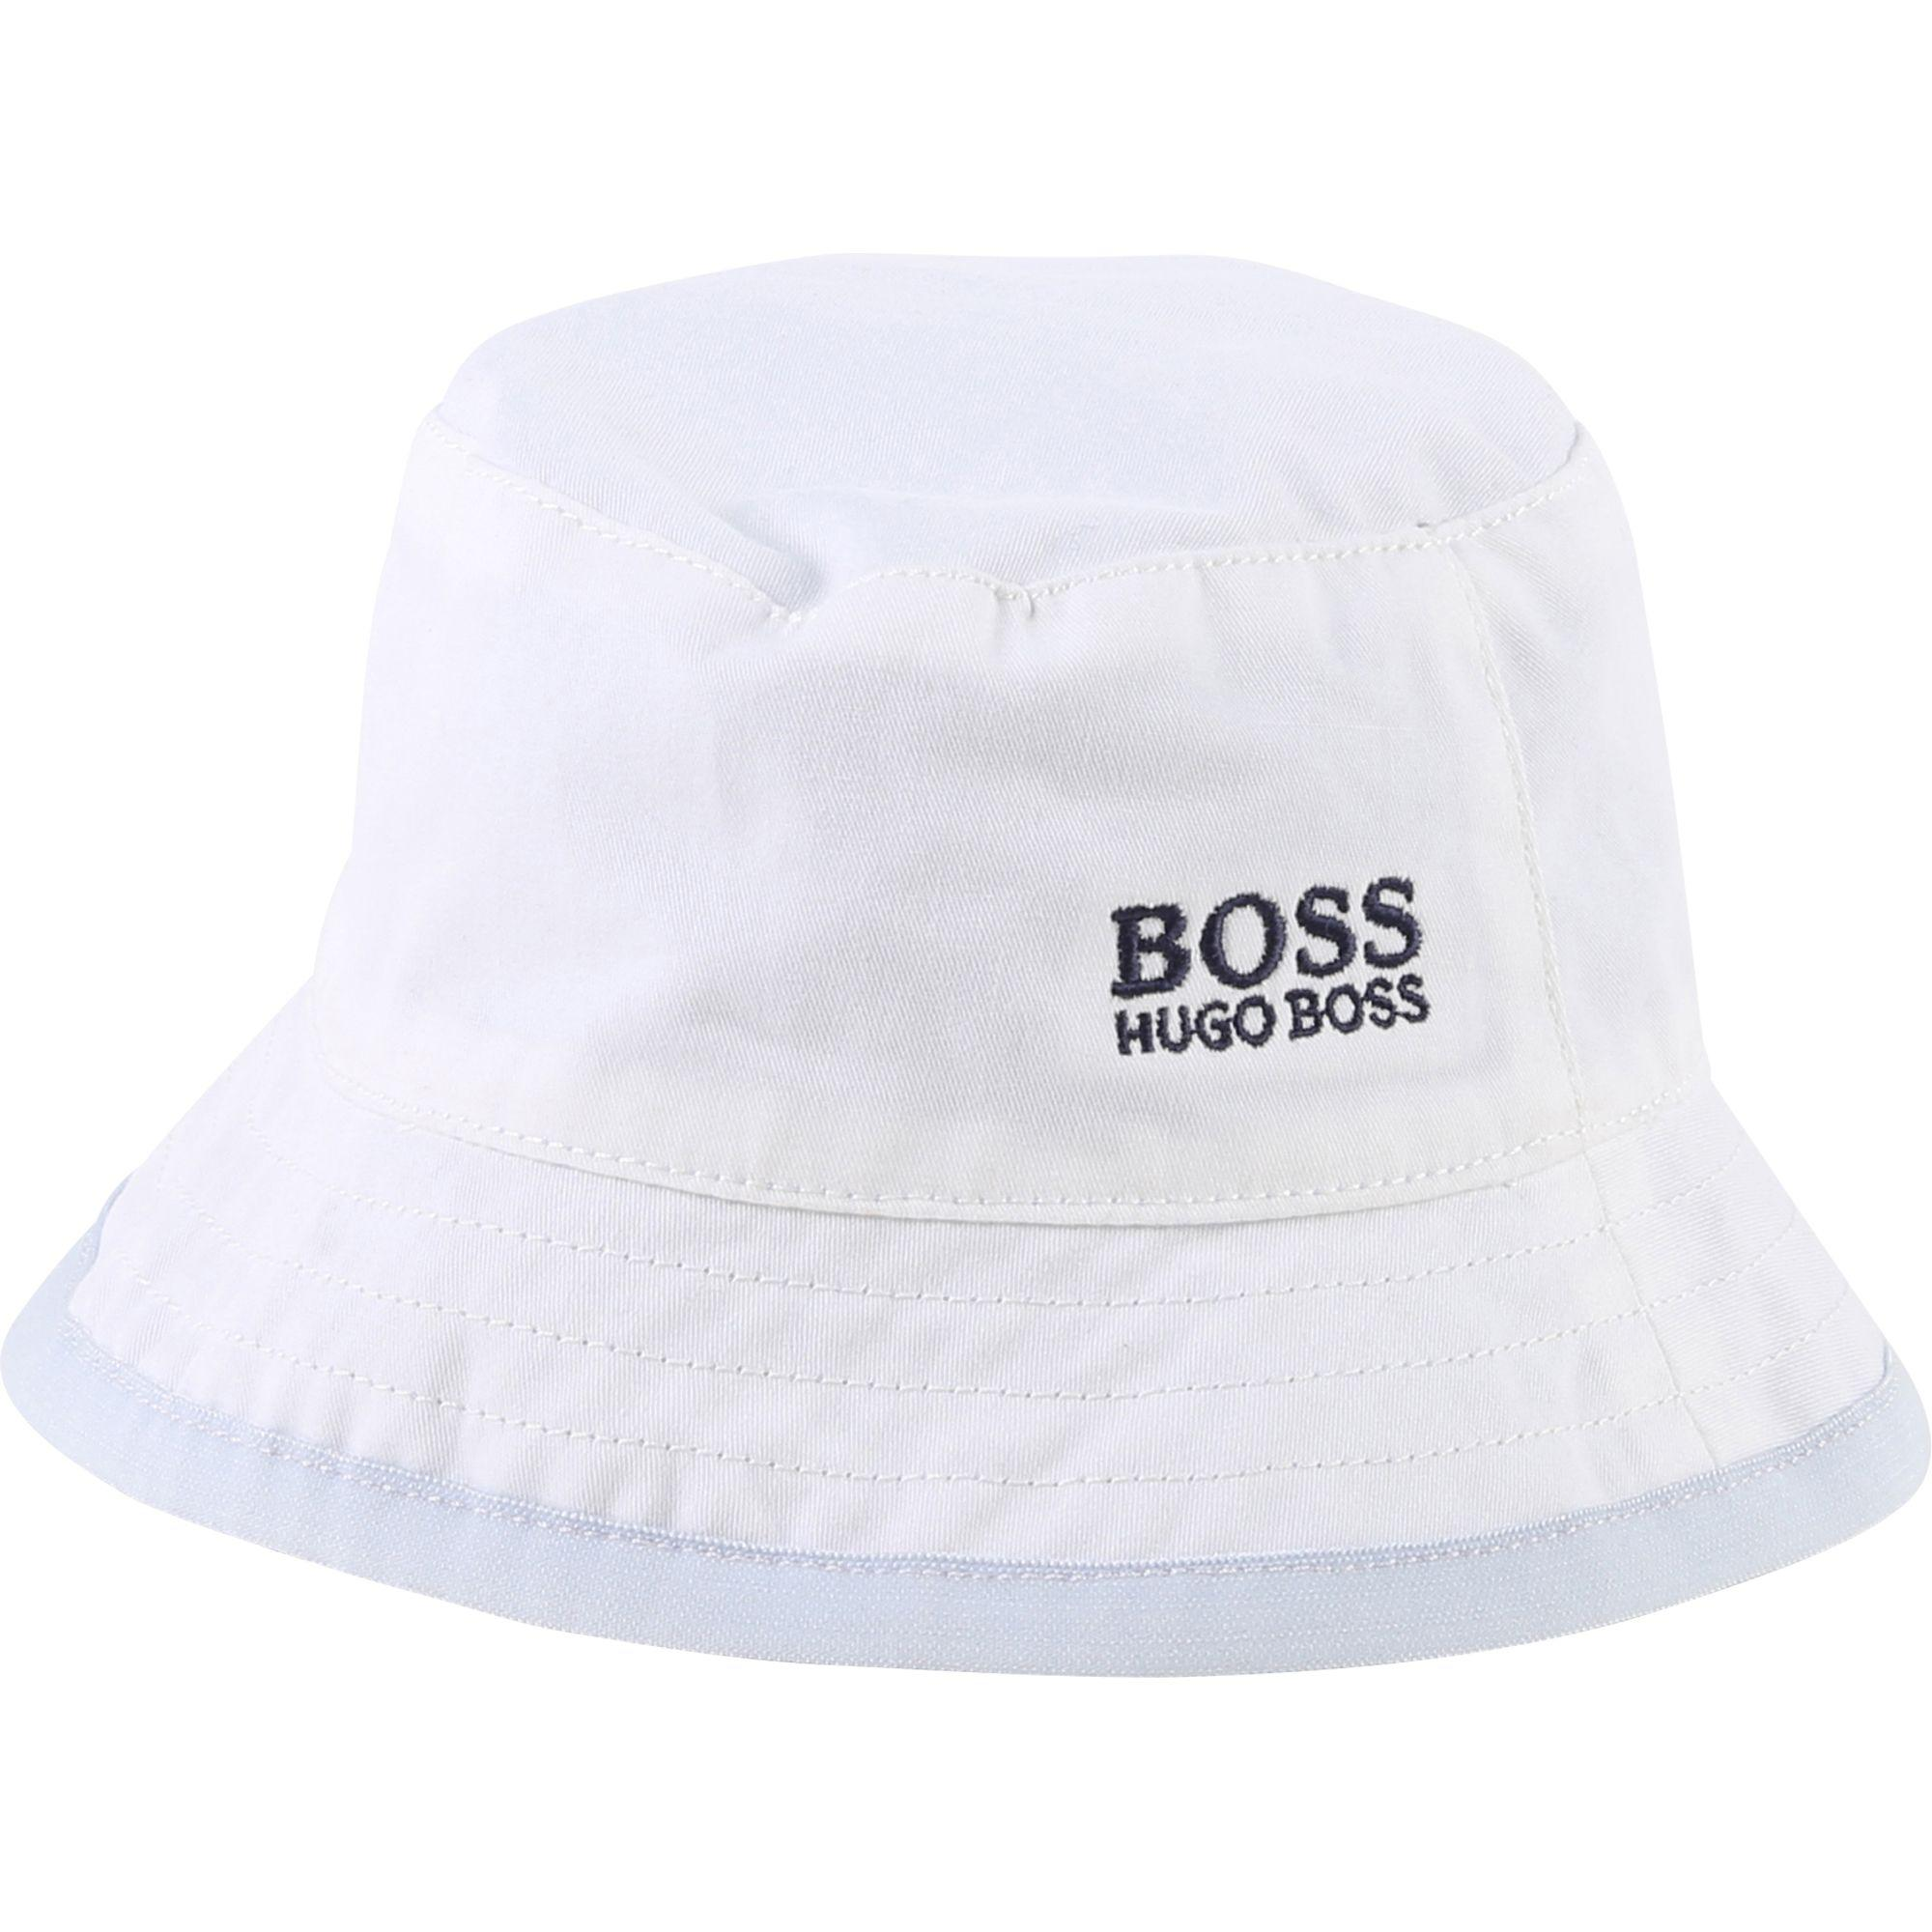 ebfd8b2c05a Boss Baby Boys Reversible Bucket Hat in White for Men - Lyst